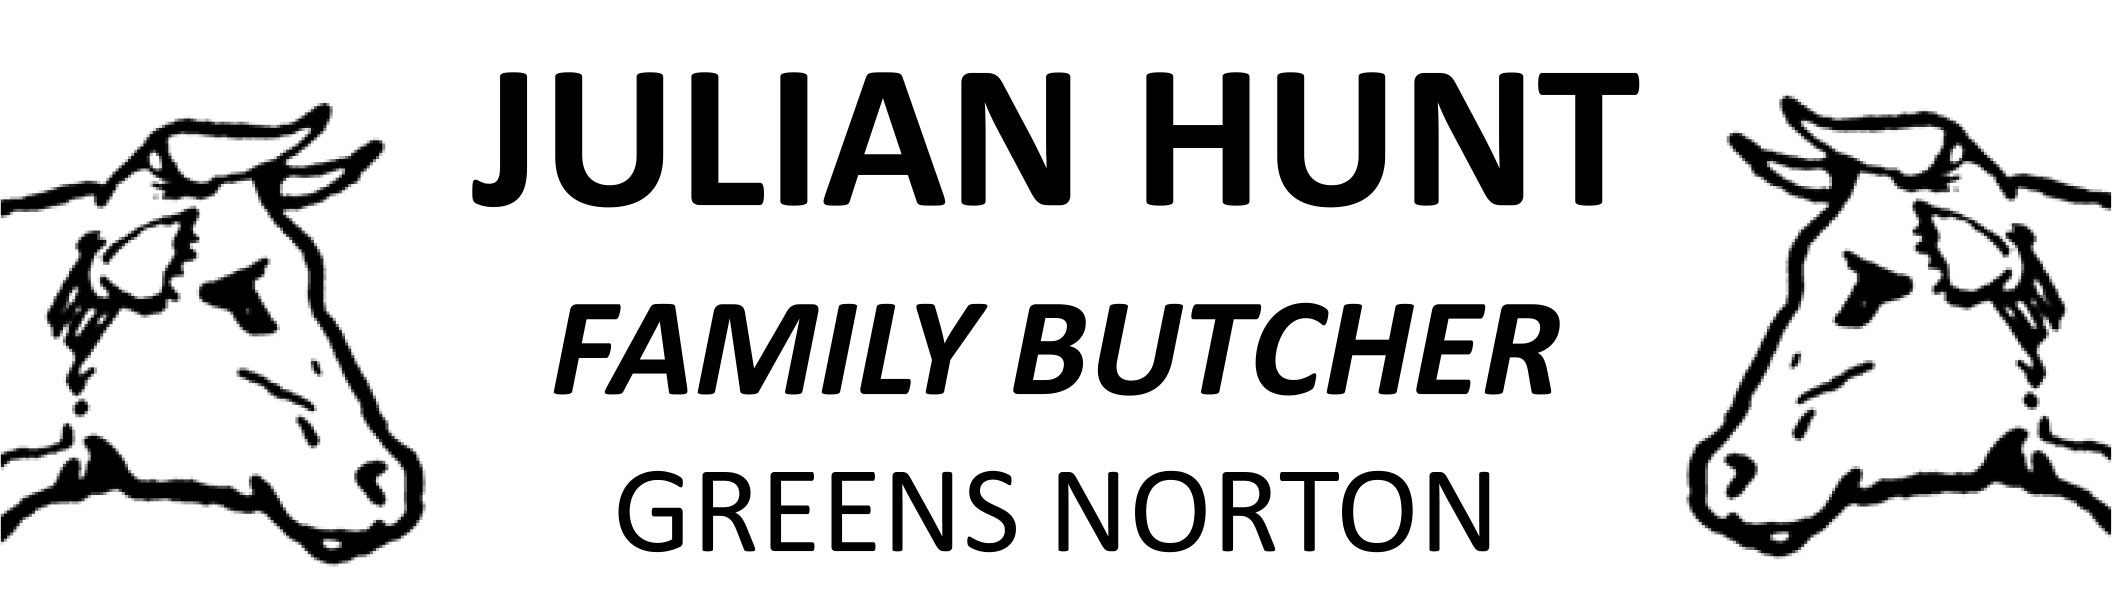 Julian Hunt Butcher